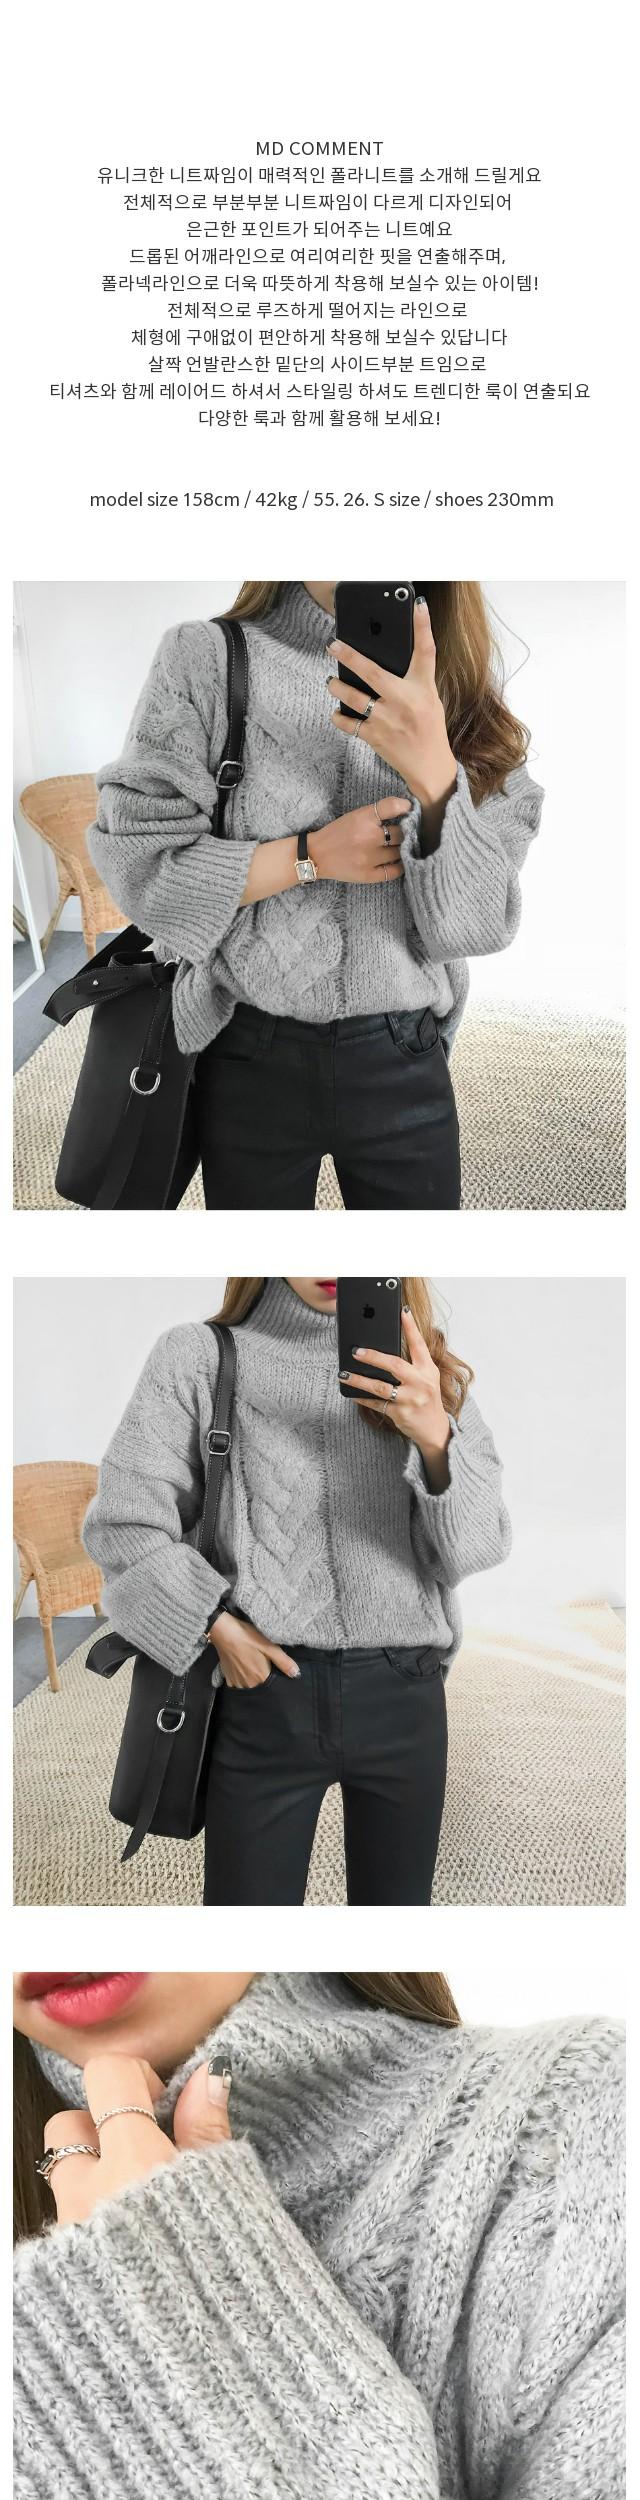 Tien exquisite polka-knit